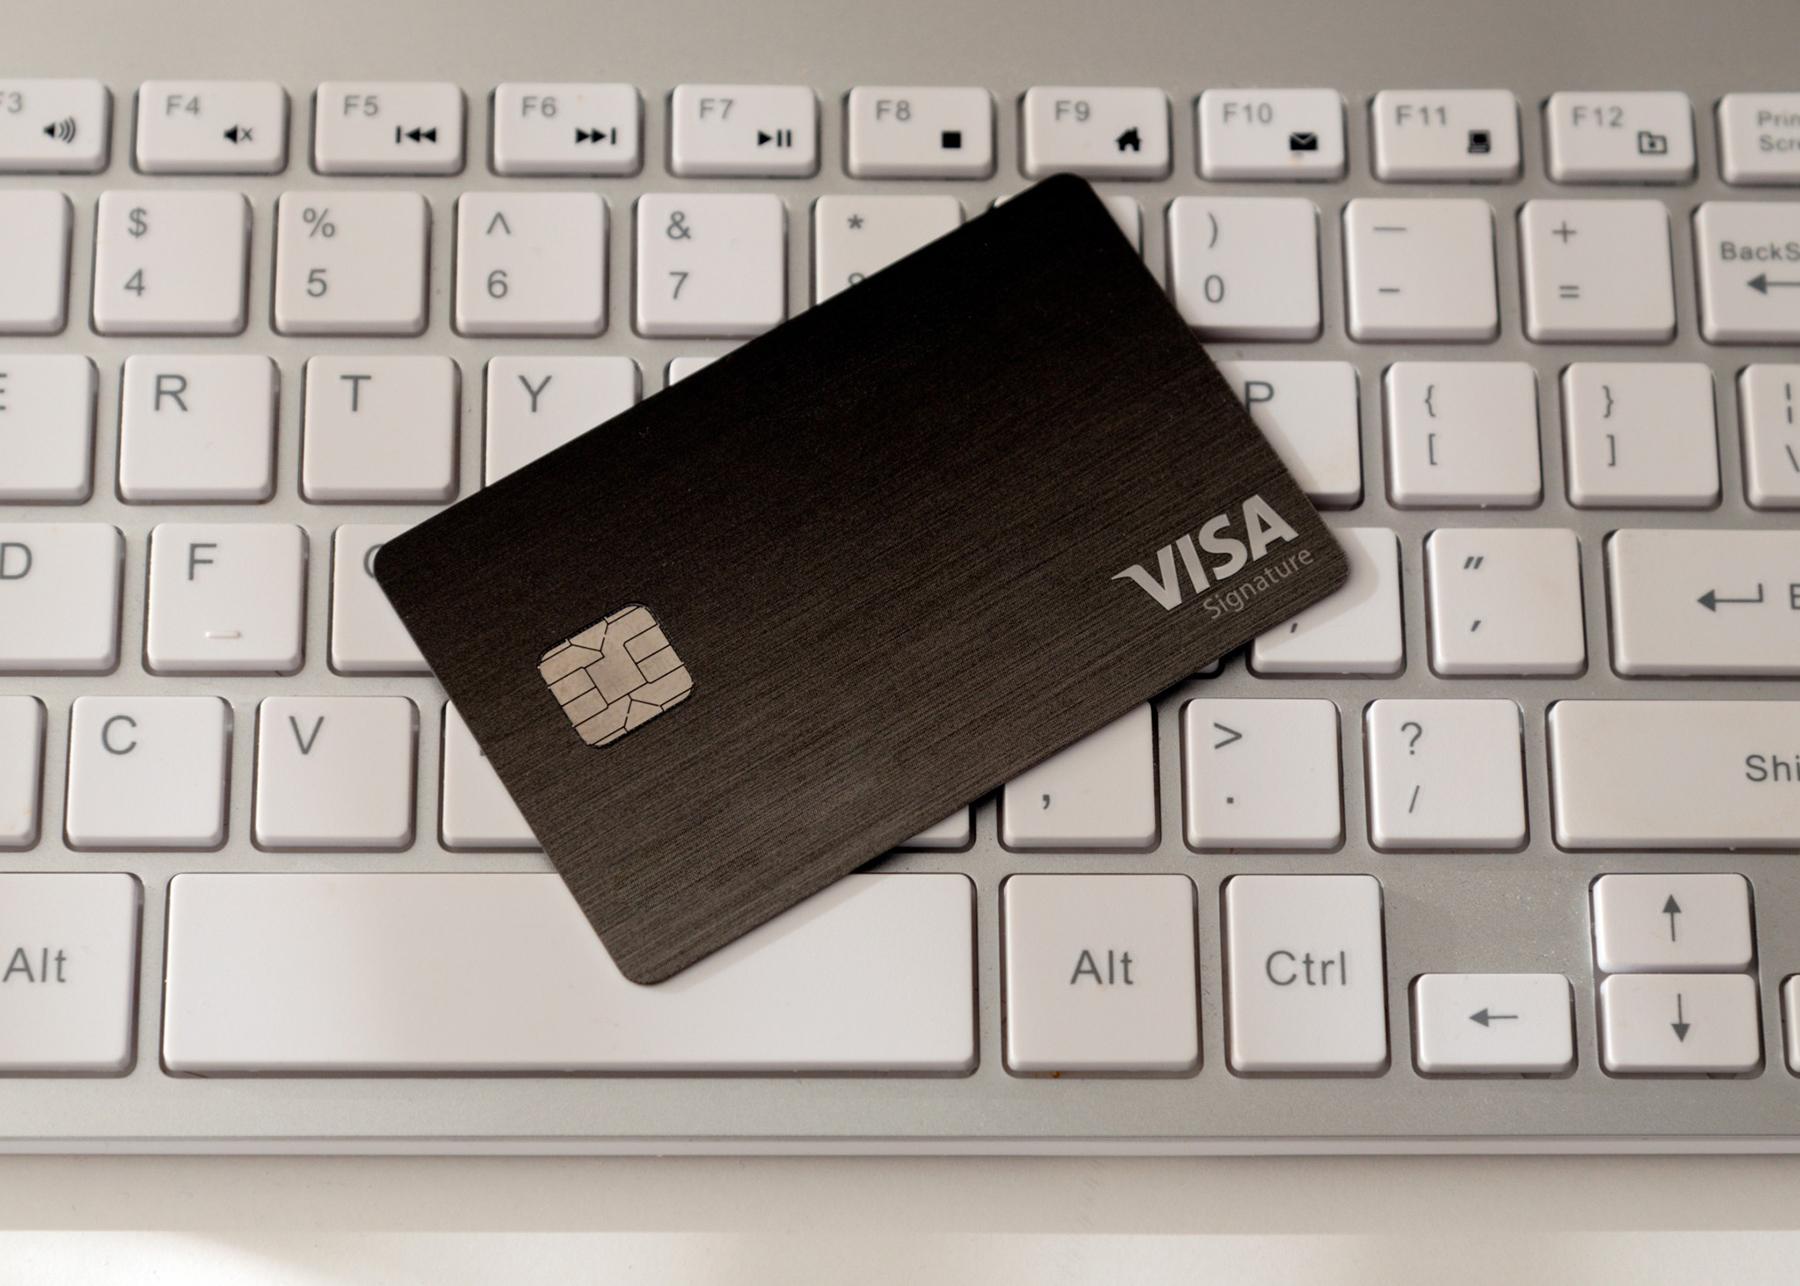 bir kripto para firmasi daha visa ile anlasti